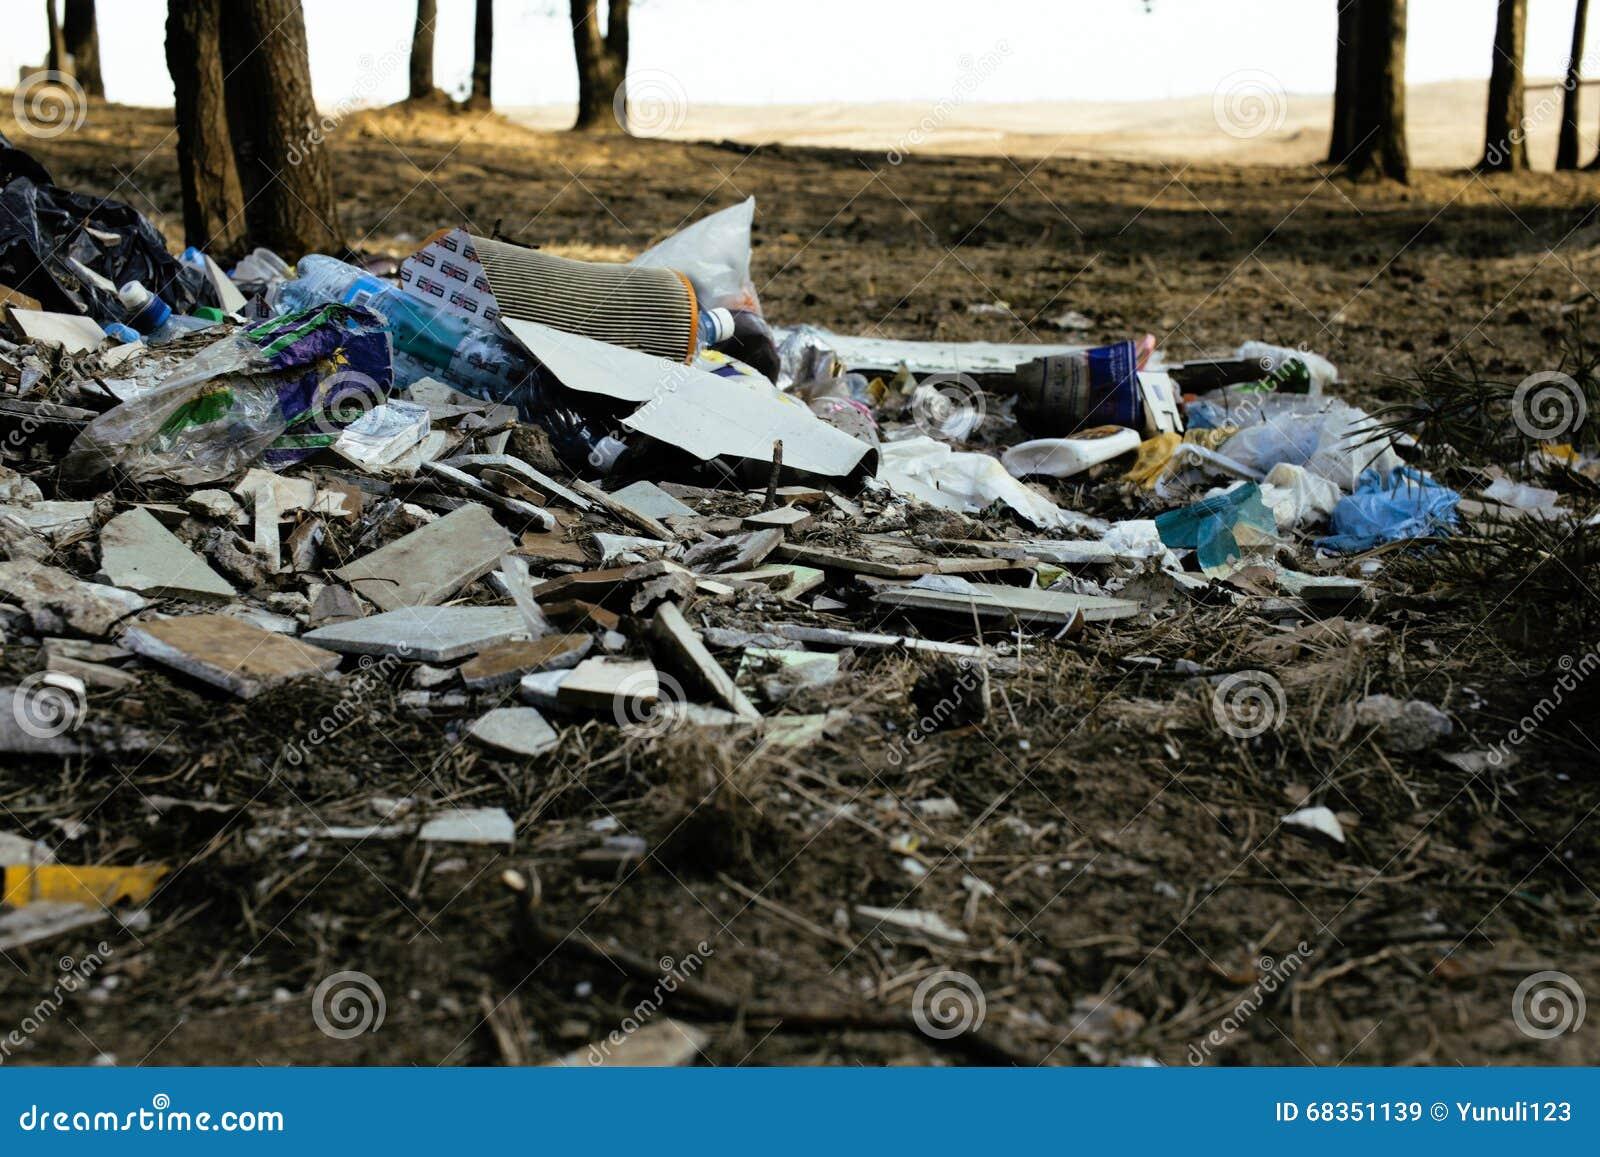 Gammal plast- avskräde i skogen, stort berg med inget omsorg av naturen, modernt miljöavfallbegrepp